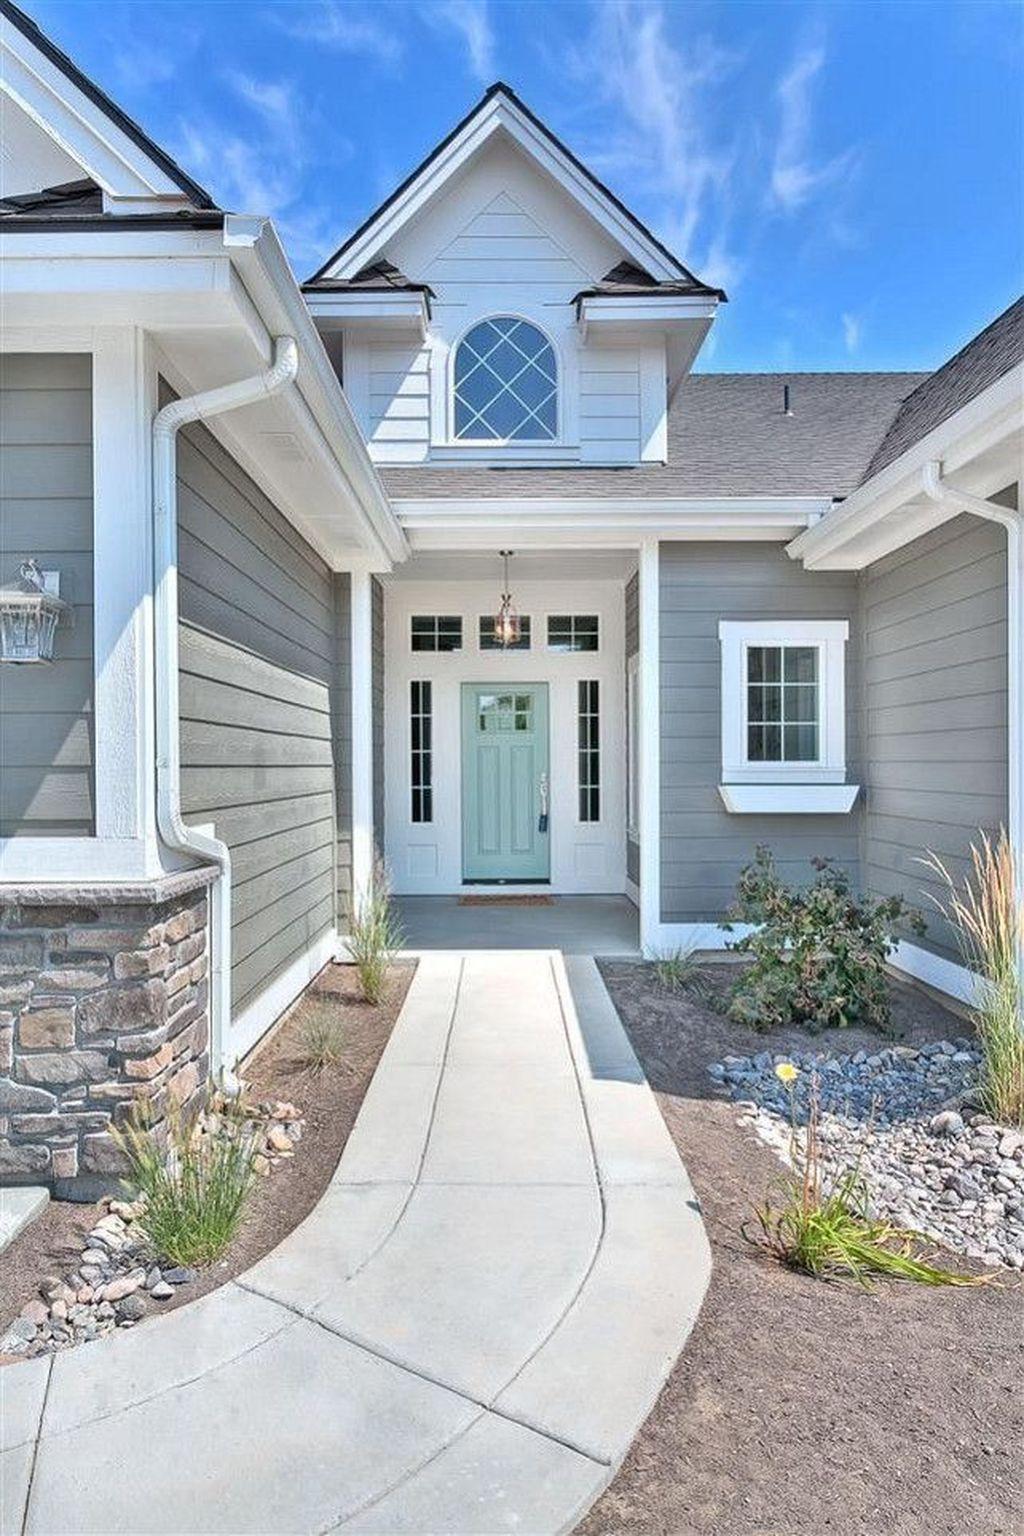 32 Popular Beach House Exterior Colors Ideas Home Design In 2019